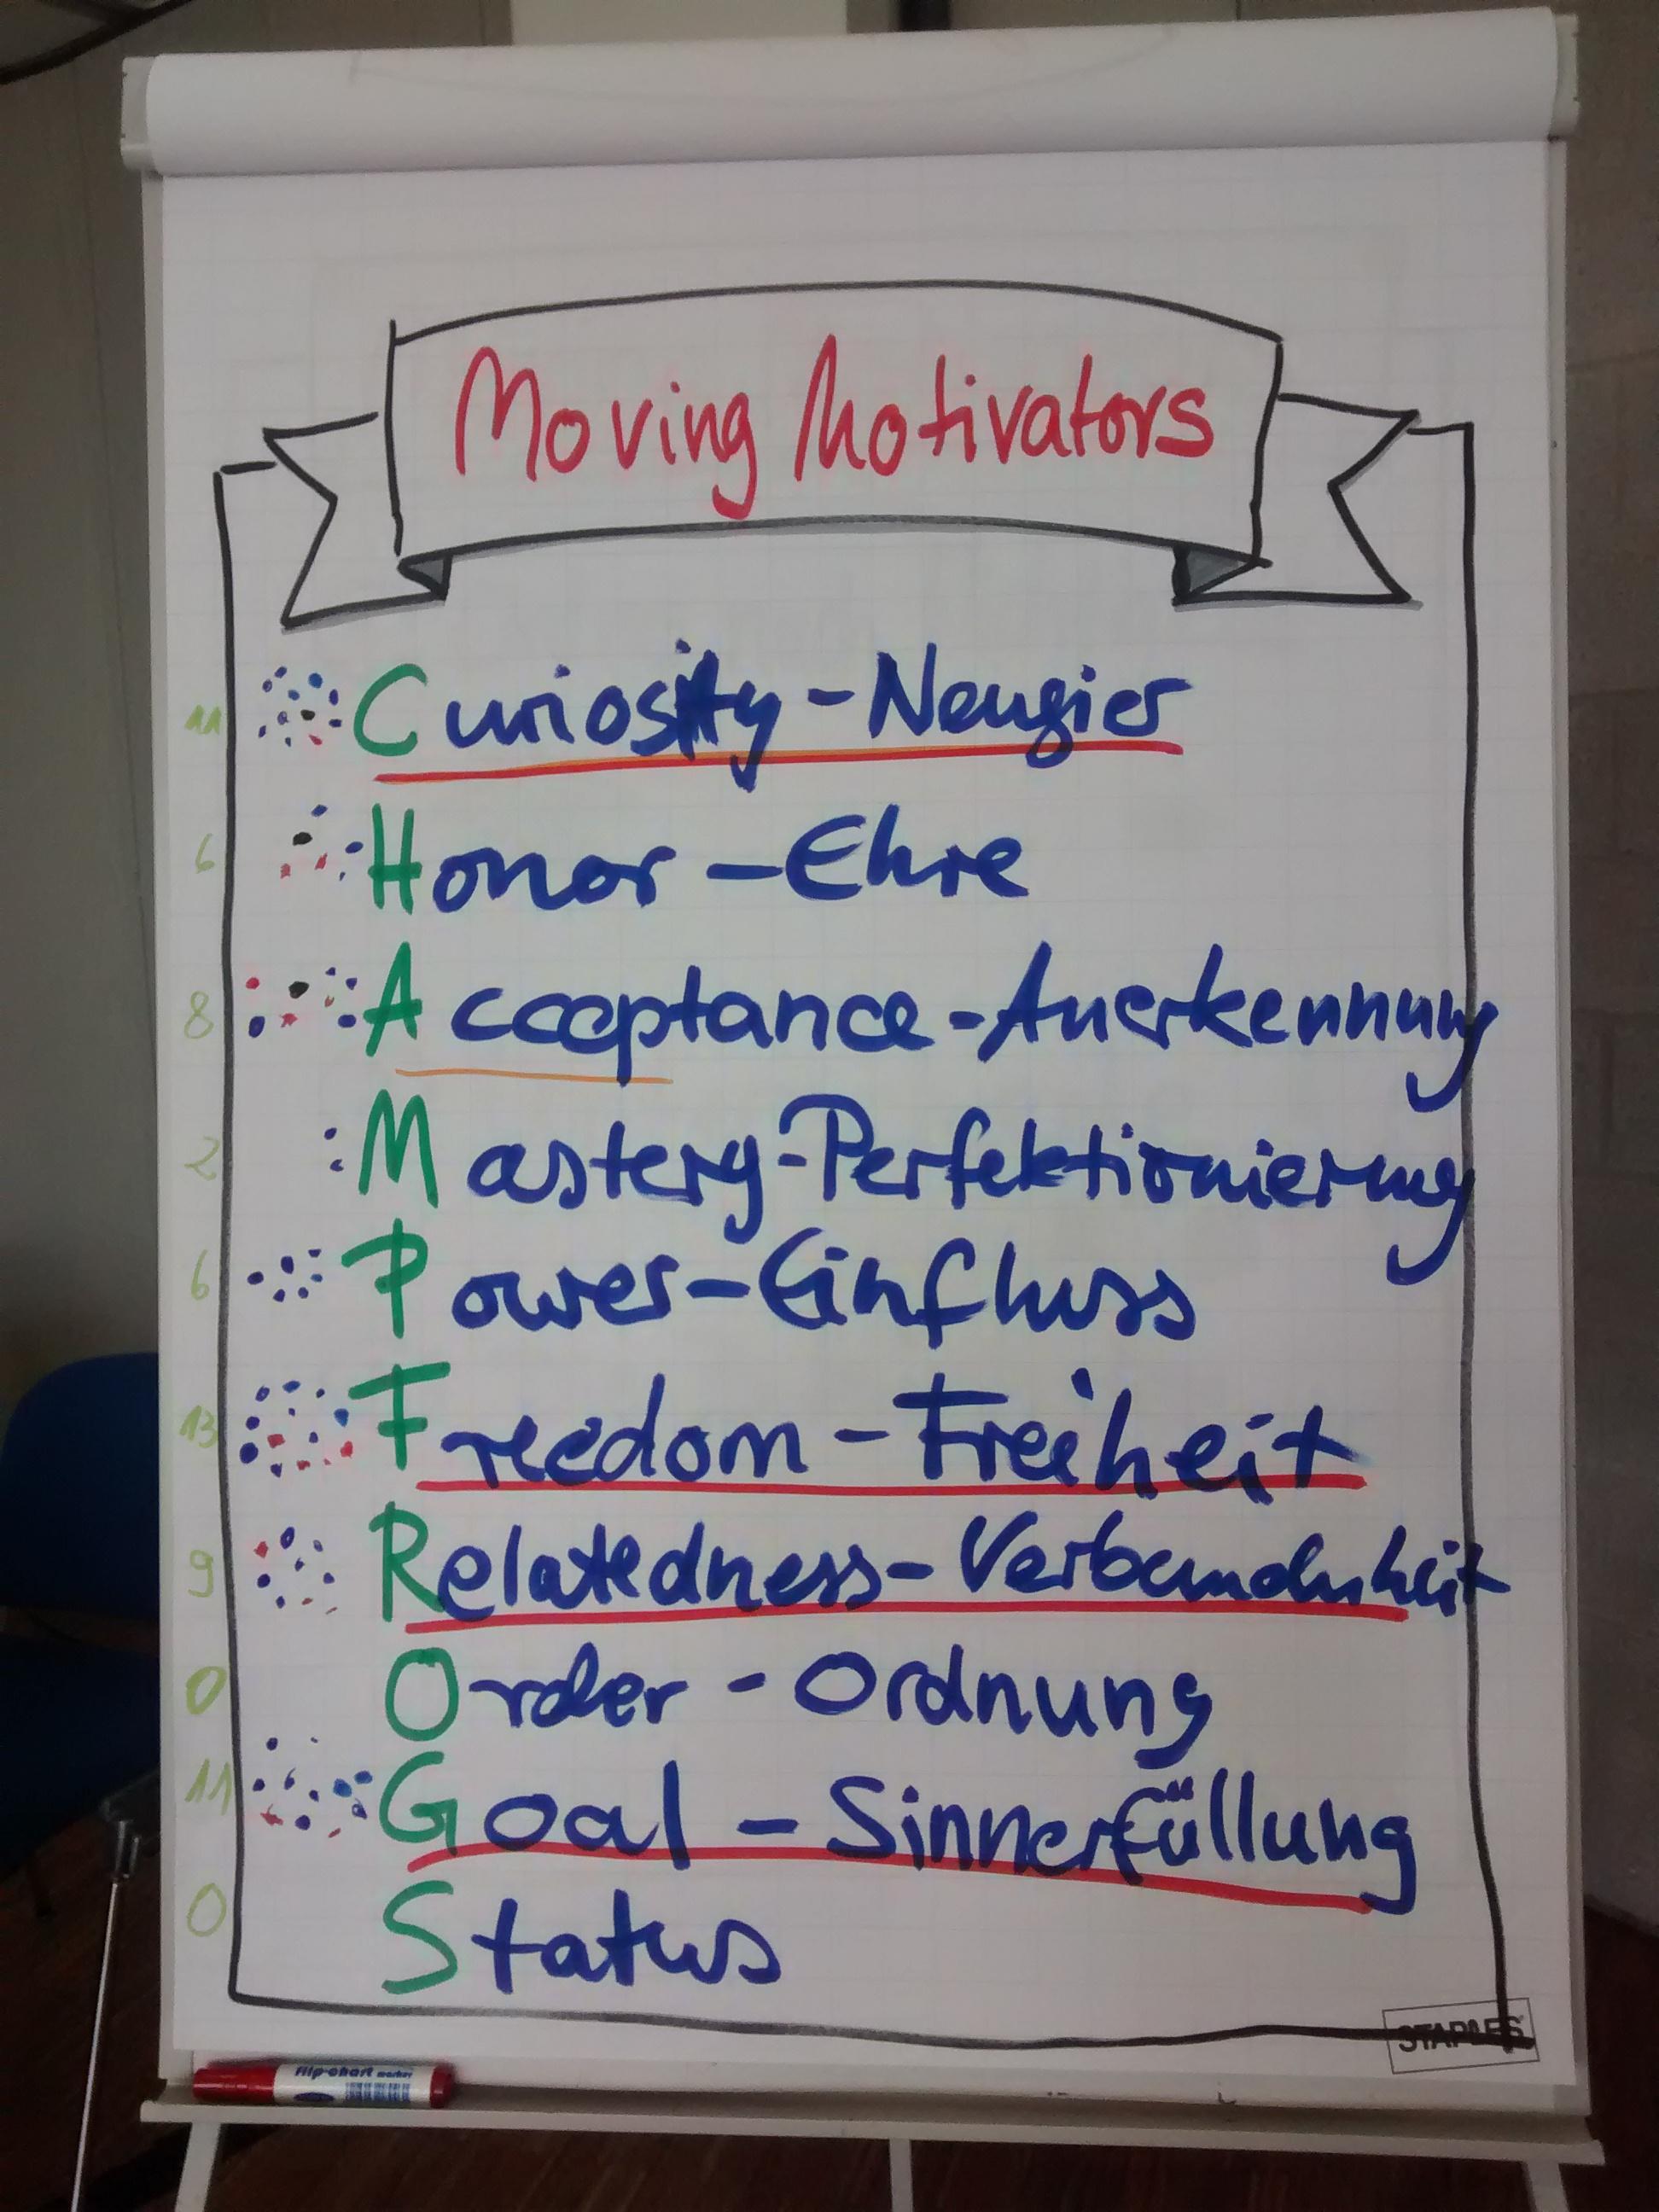 04-moving-motivators